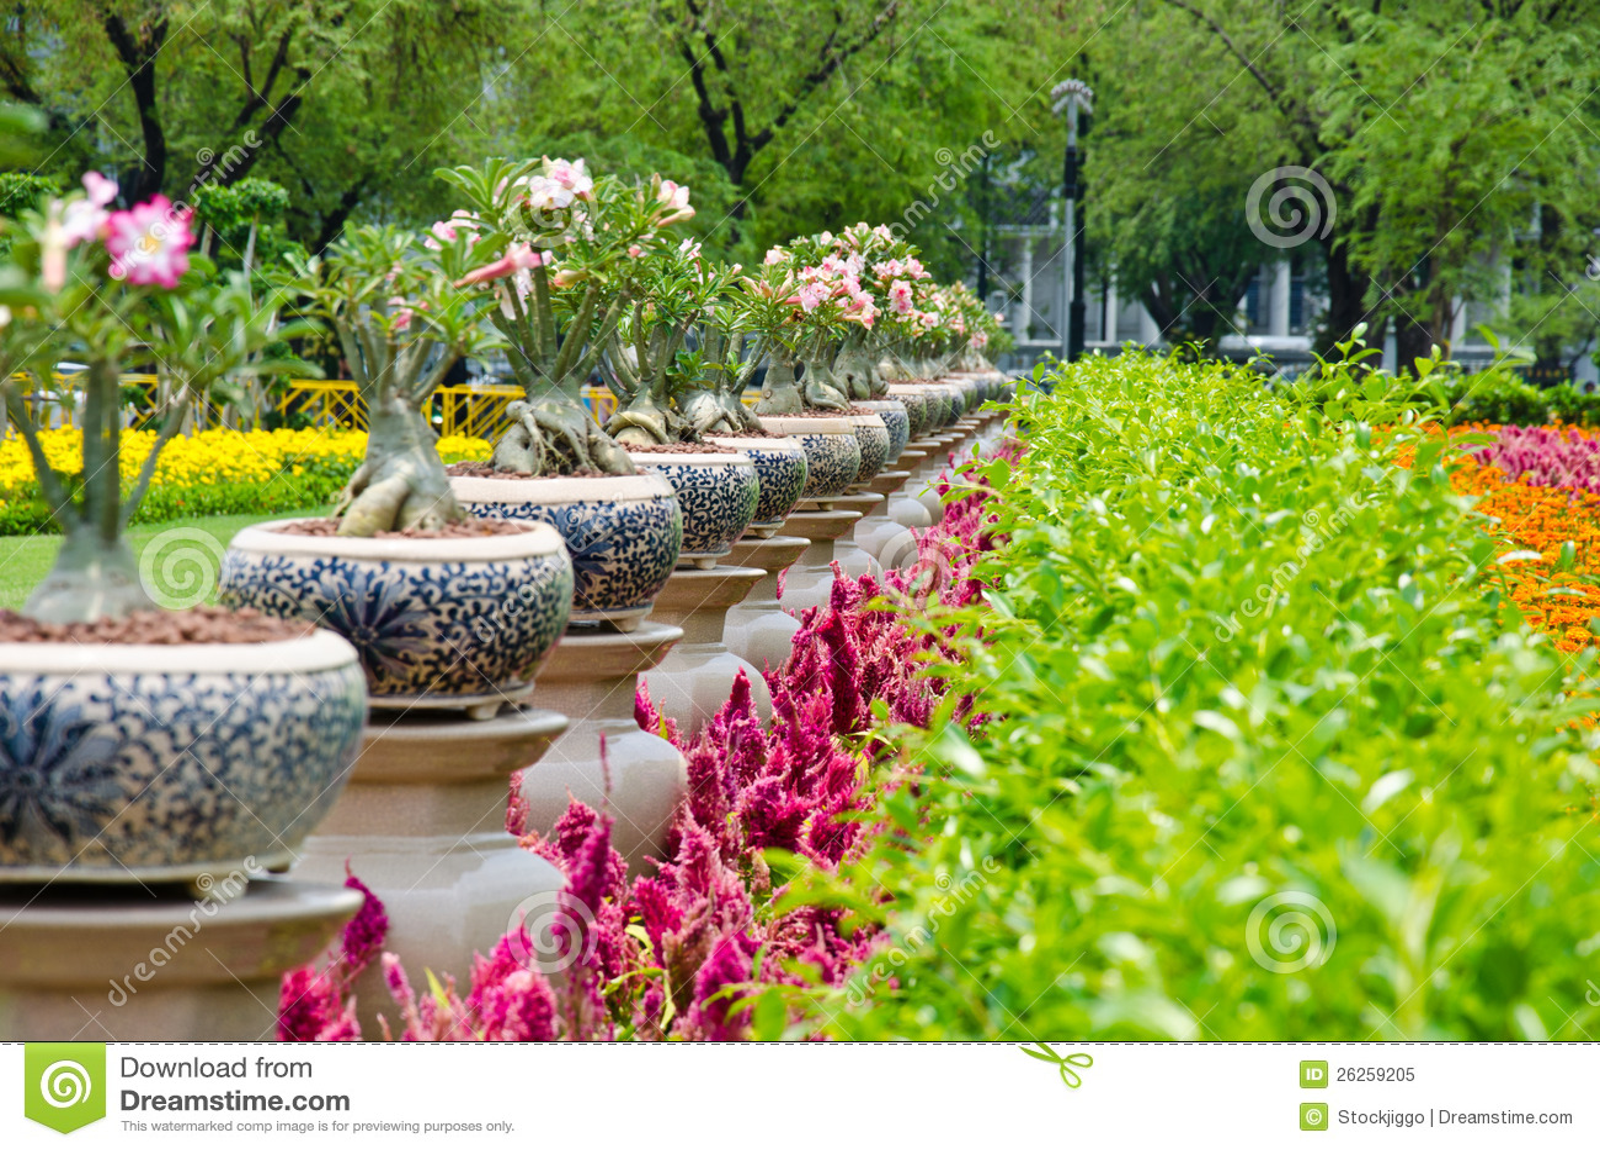 garden flower in bankok thailand royalty free stock photo image 26259205. Black Bedroom Furniture Sets. Home Design Ideas